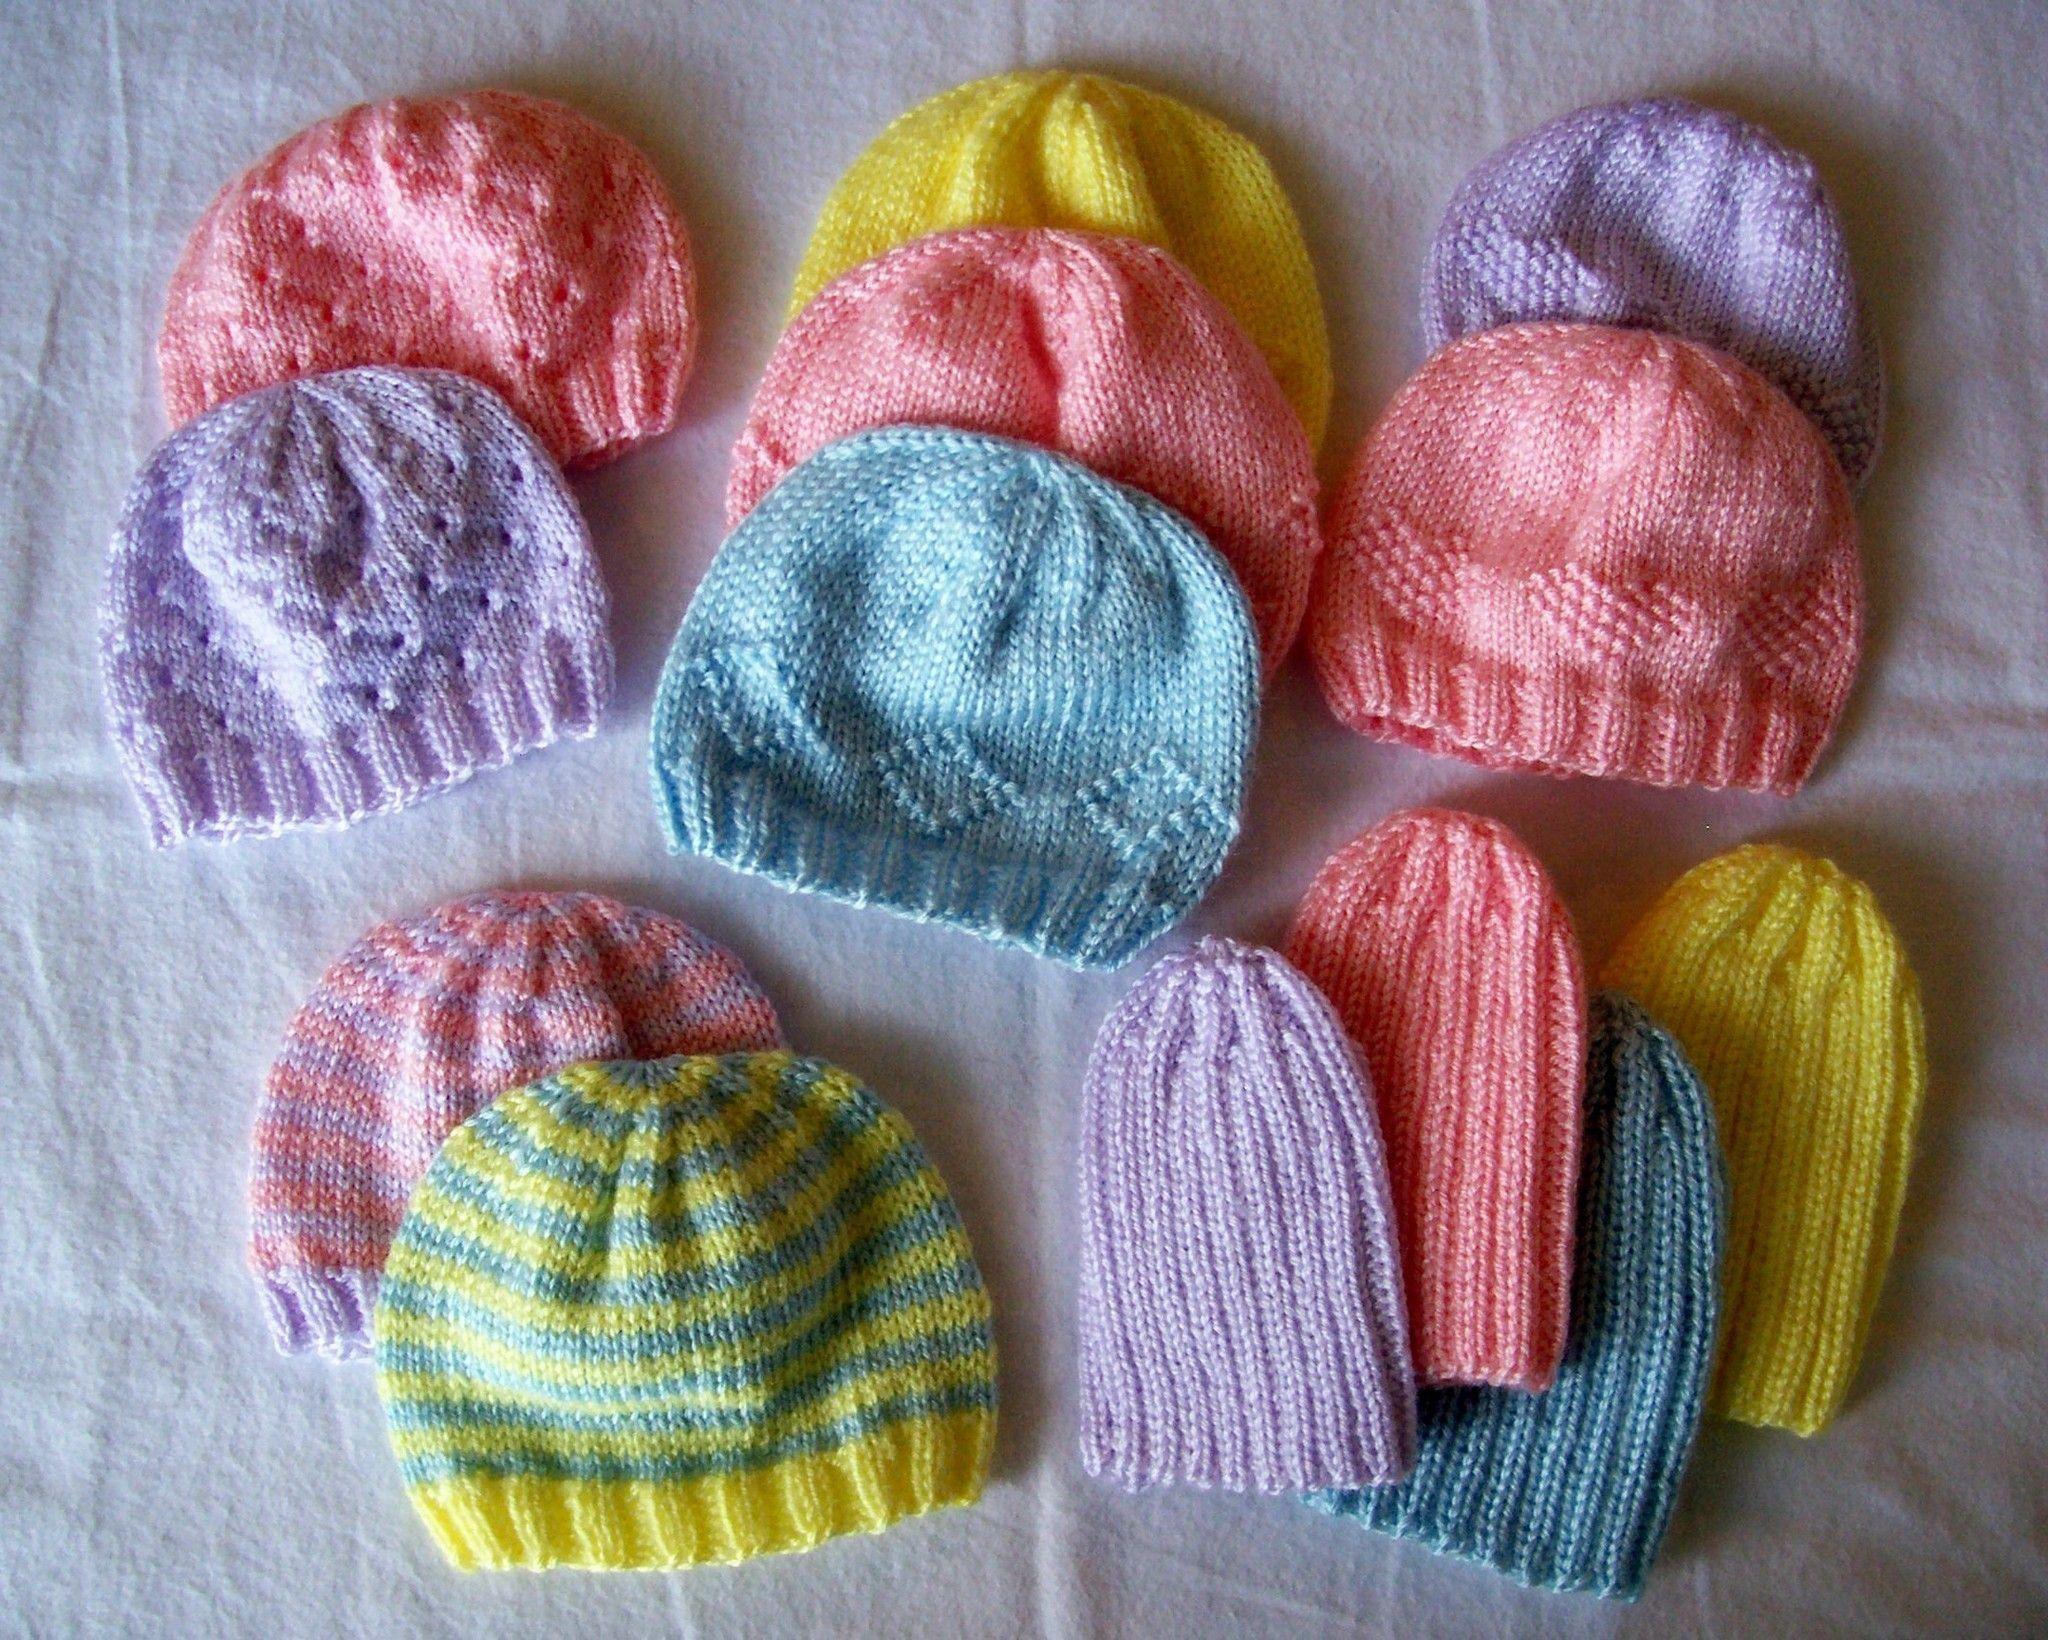 Preemie Hats For Charity Yarning Pinterest Preemies Sport